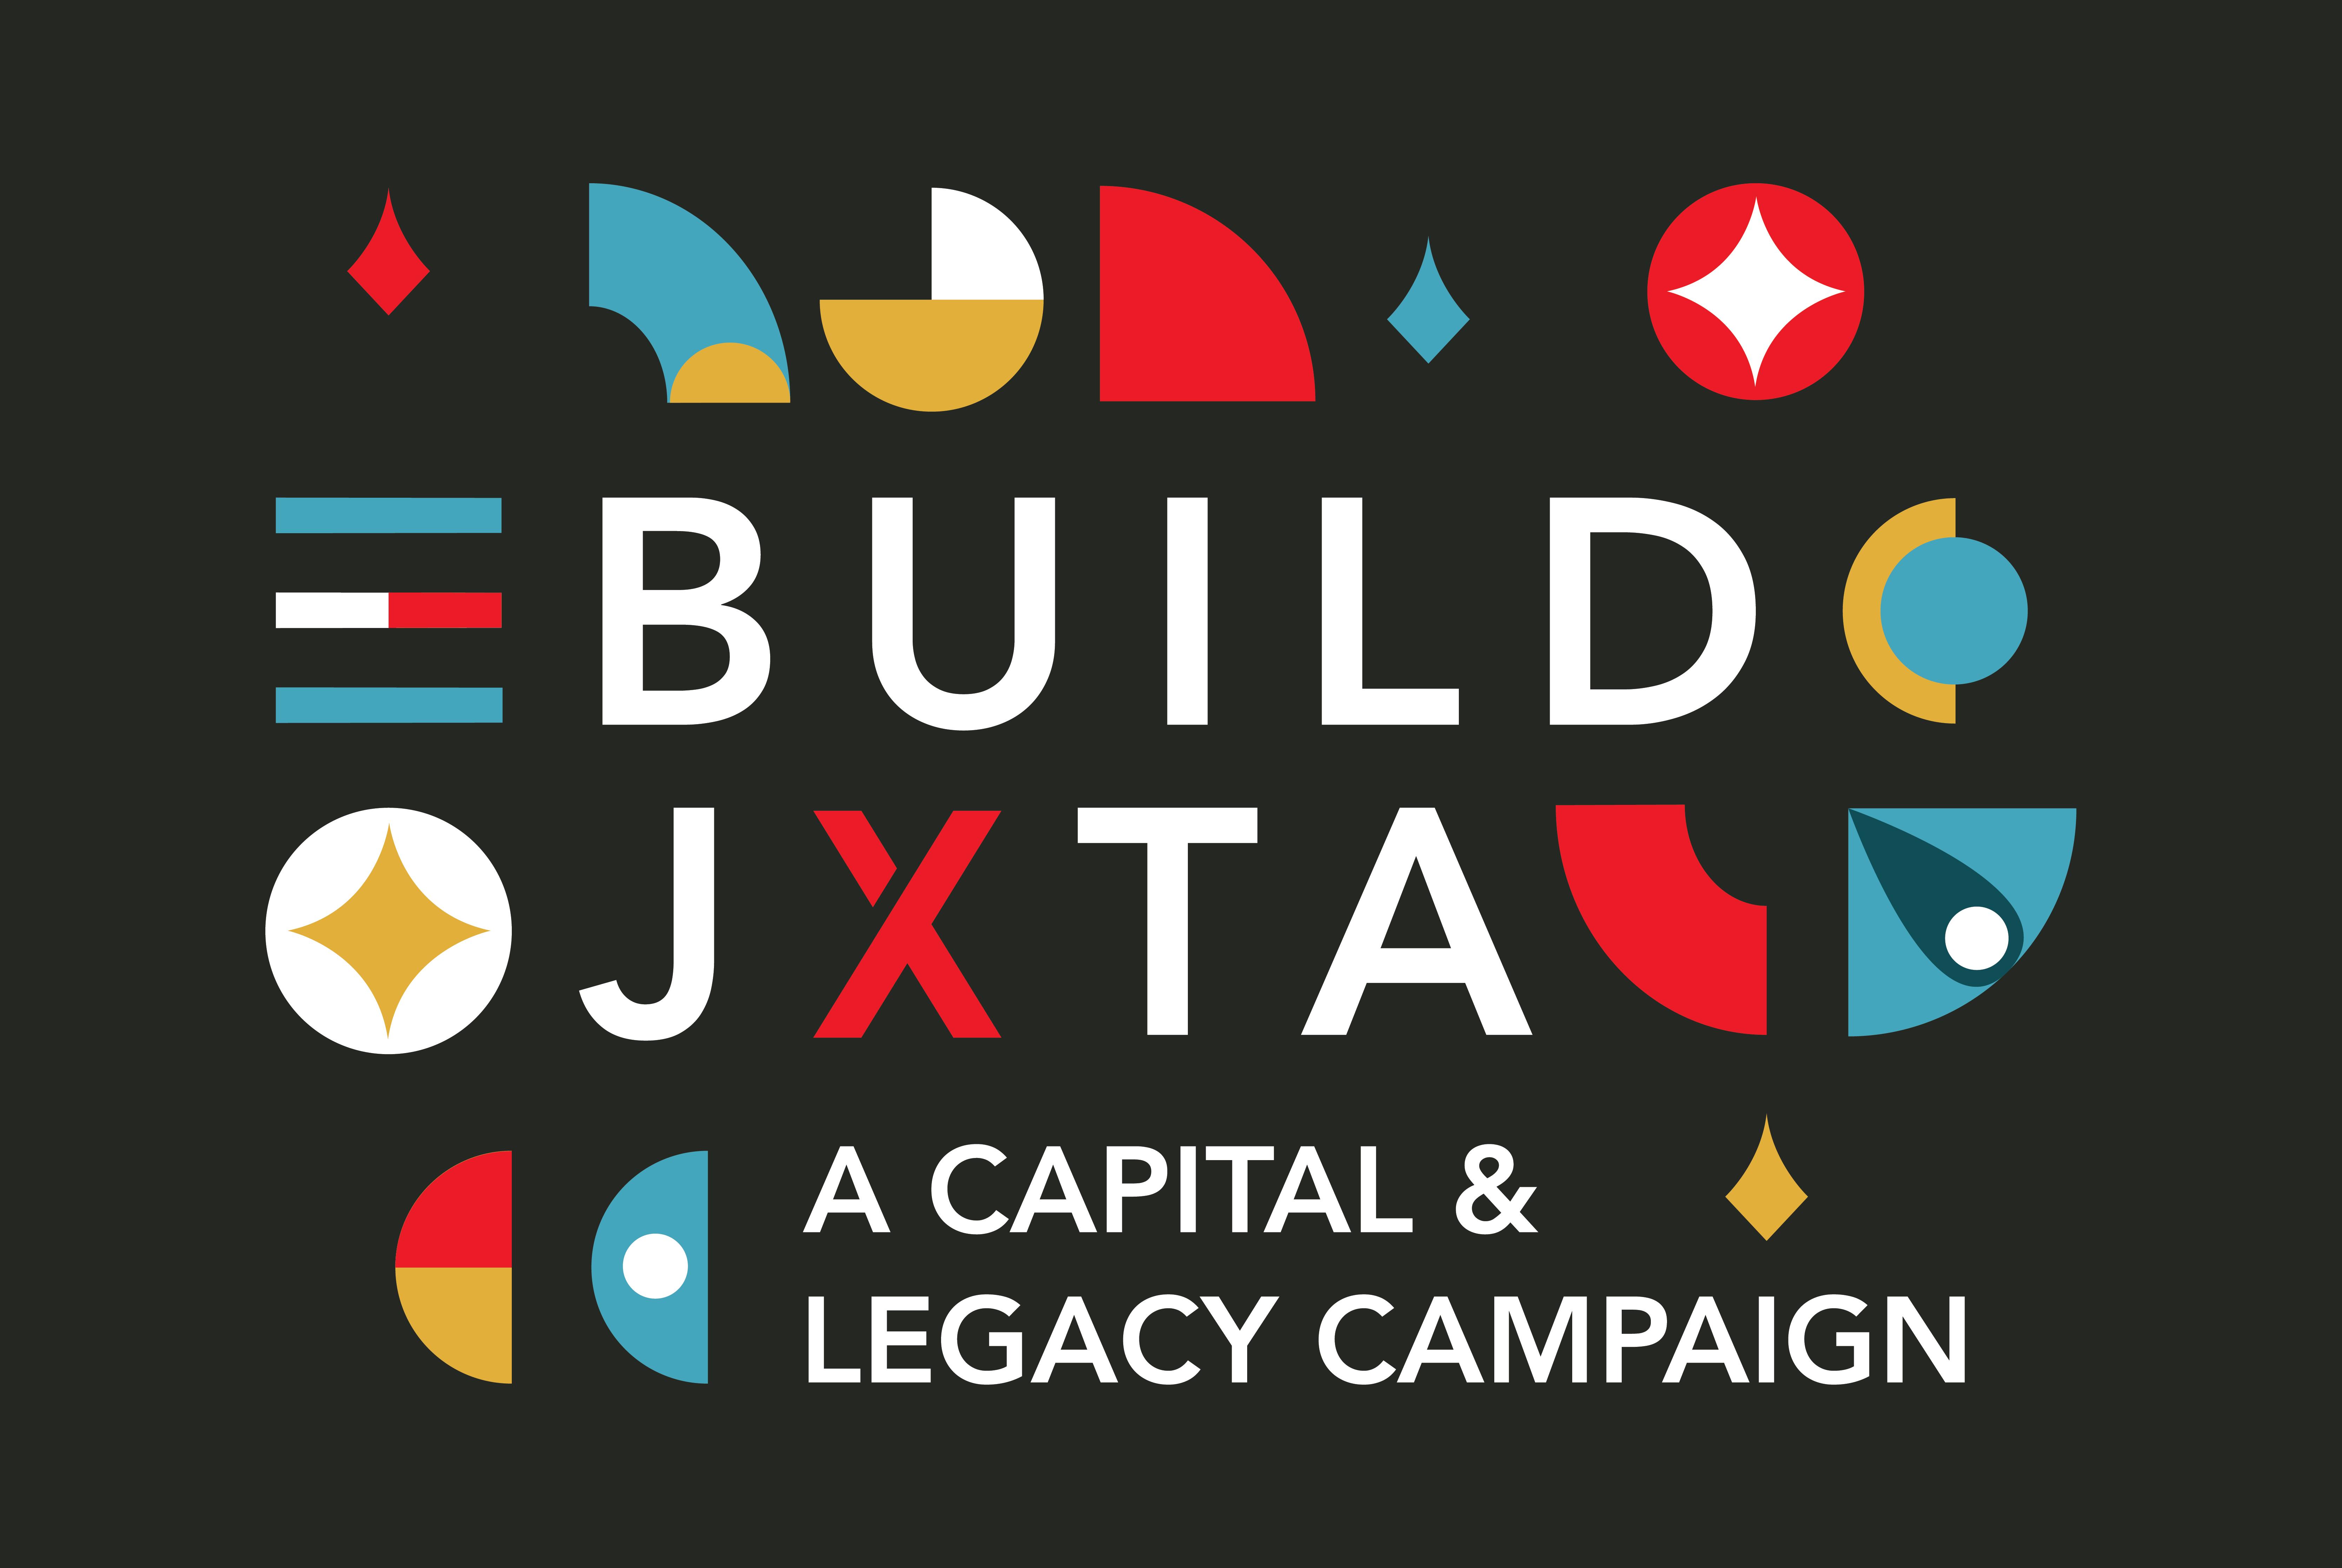 https://juxtapositionarts.org/wp-content/uploads/2020/01/Build_JXTA_CapitalLegacy_Promo.png